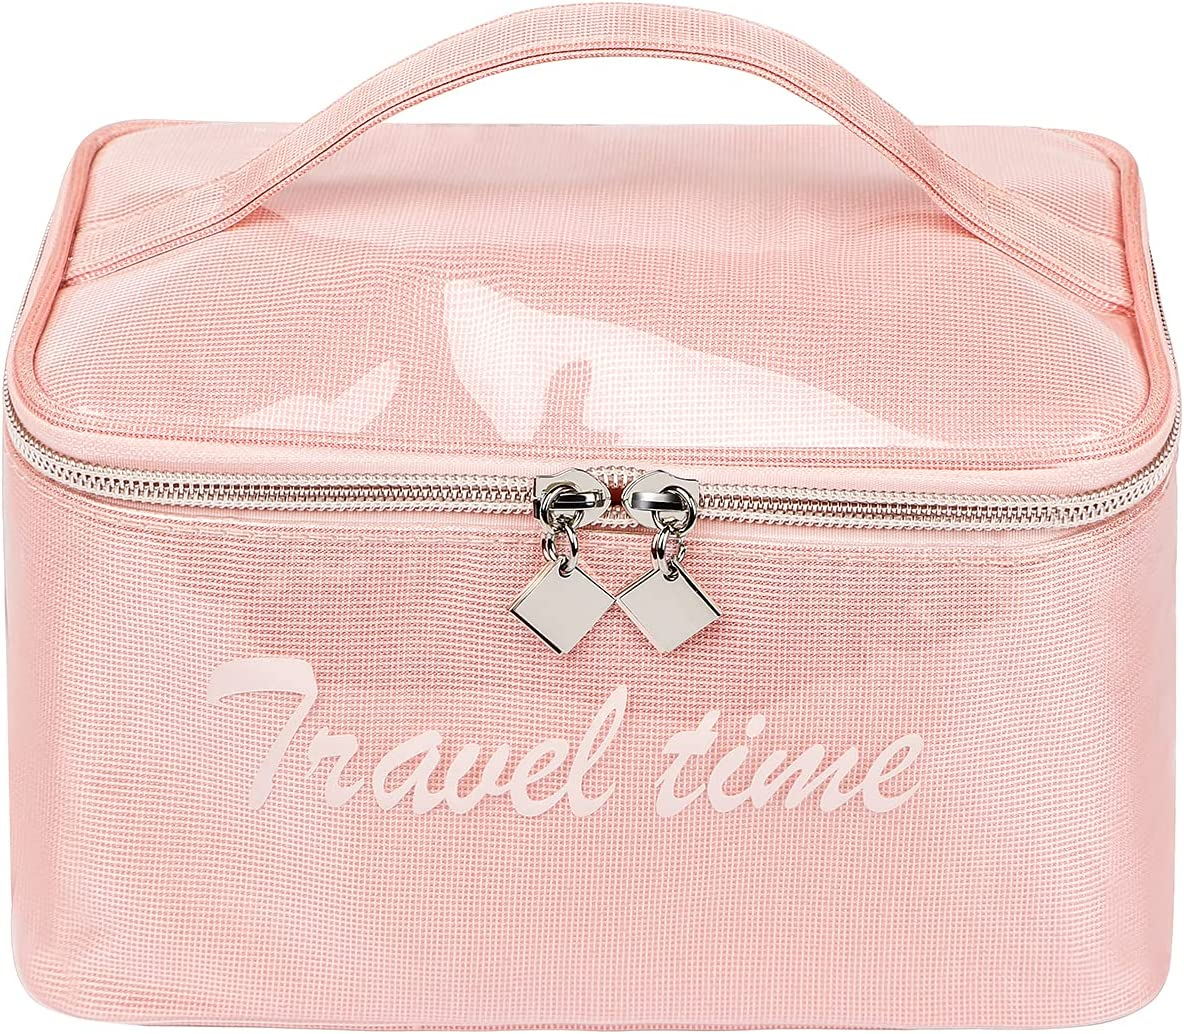 Makeup Bag FUNGOS Large Cosmetic Women Le Popular Cheap bargain overseas for PU